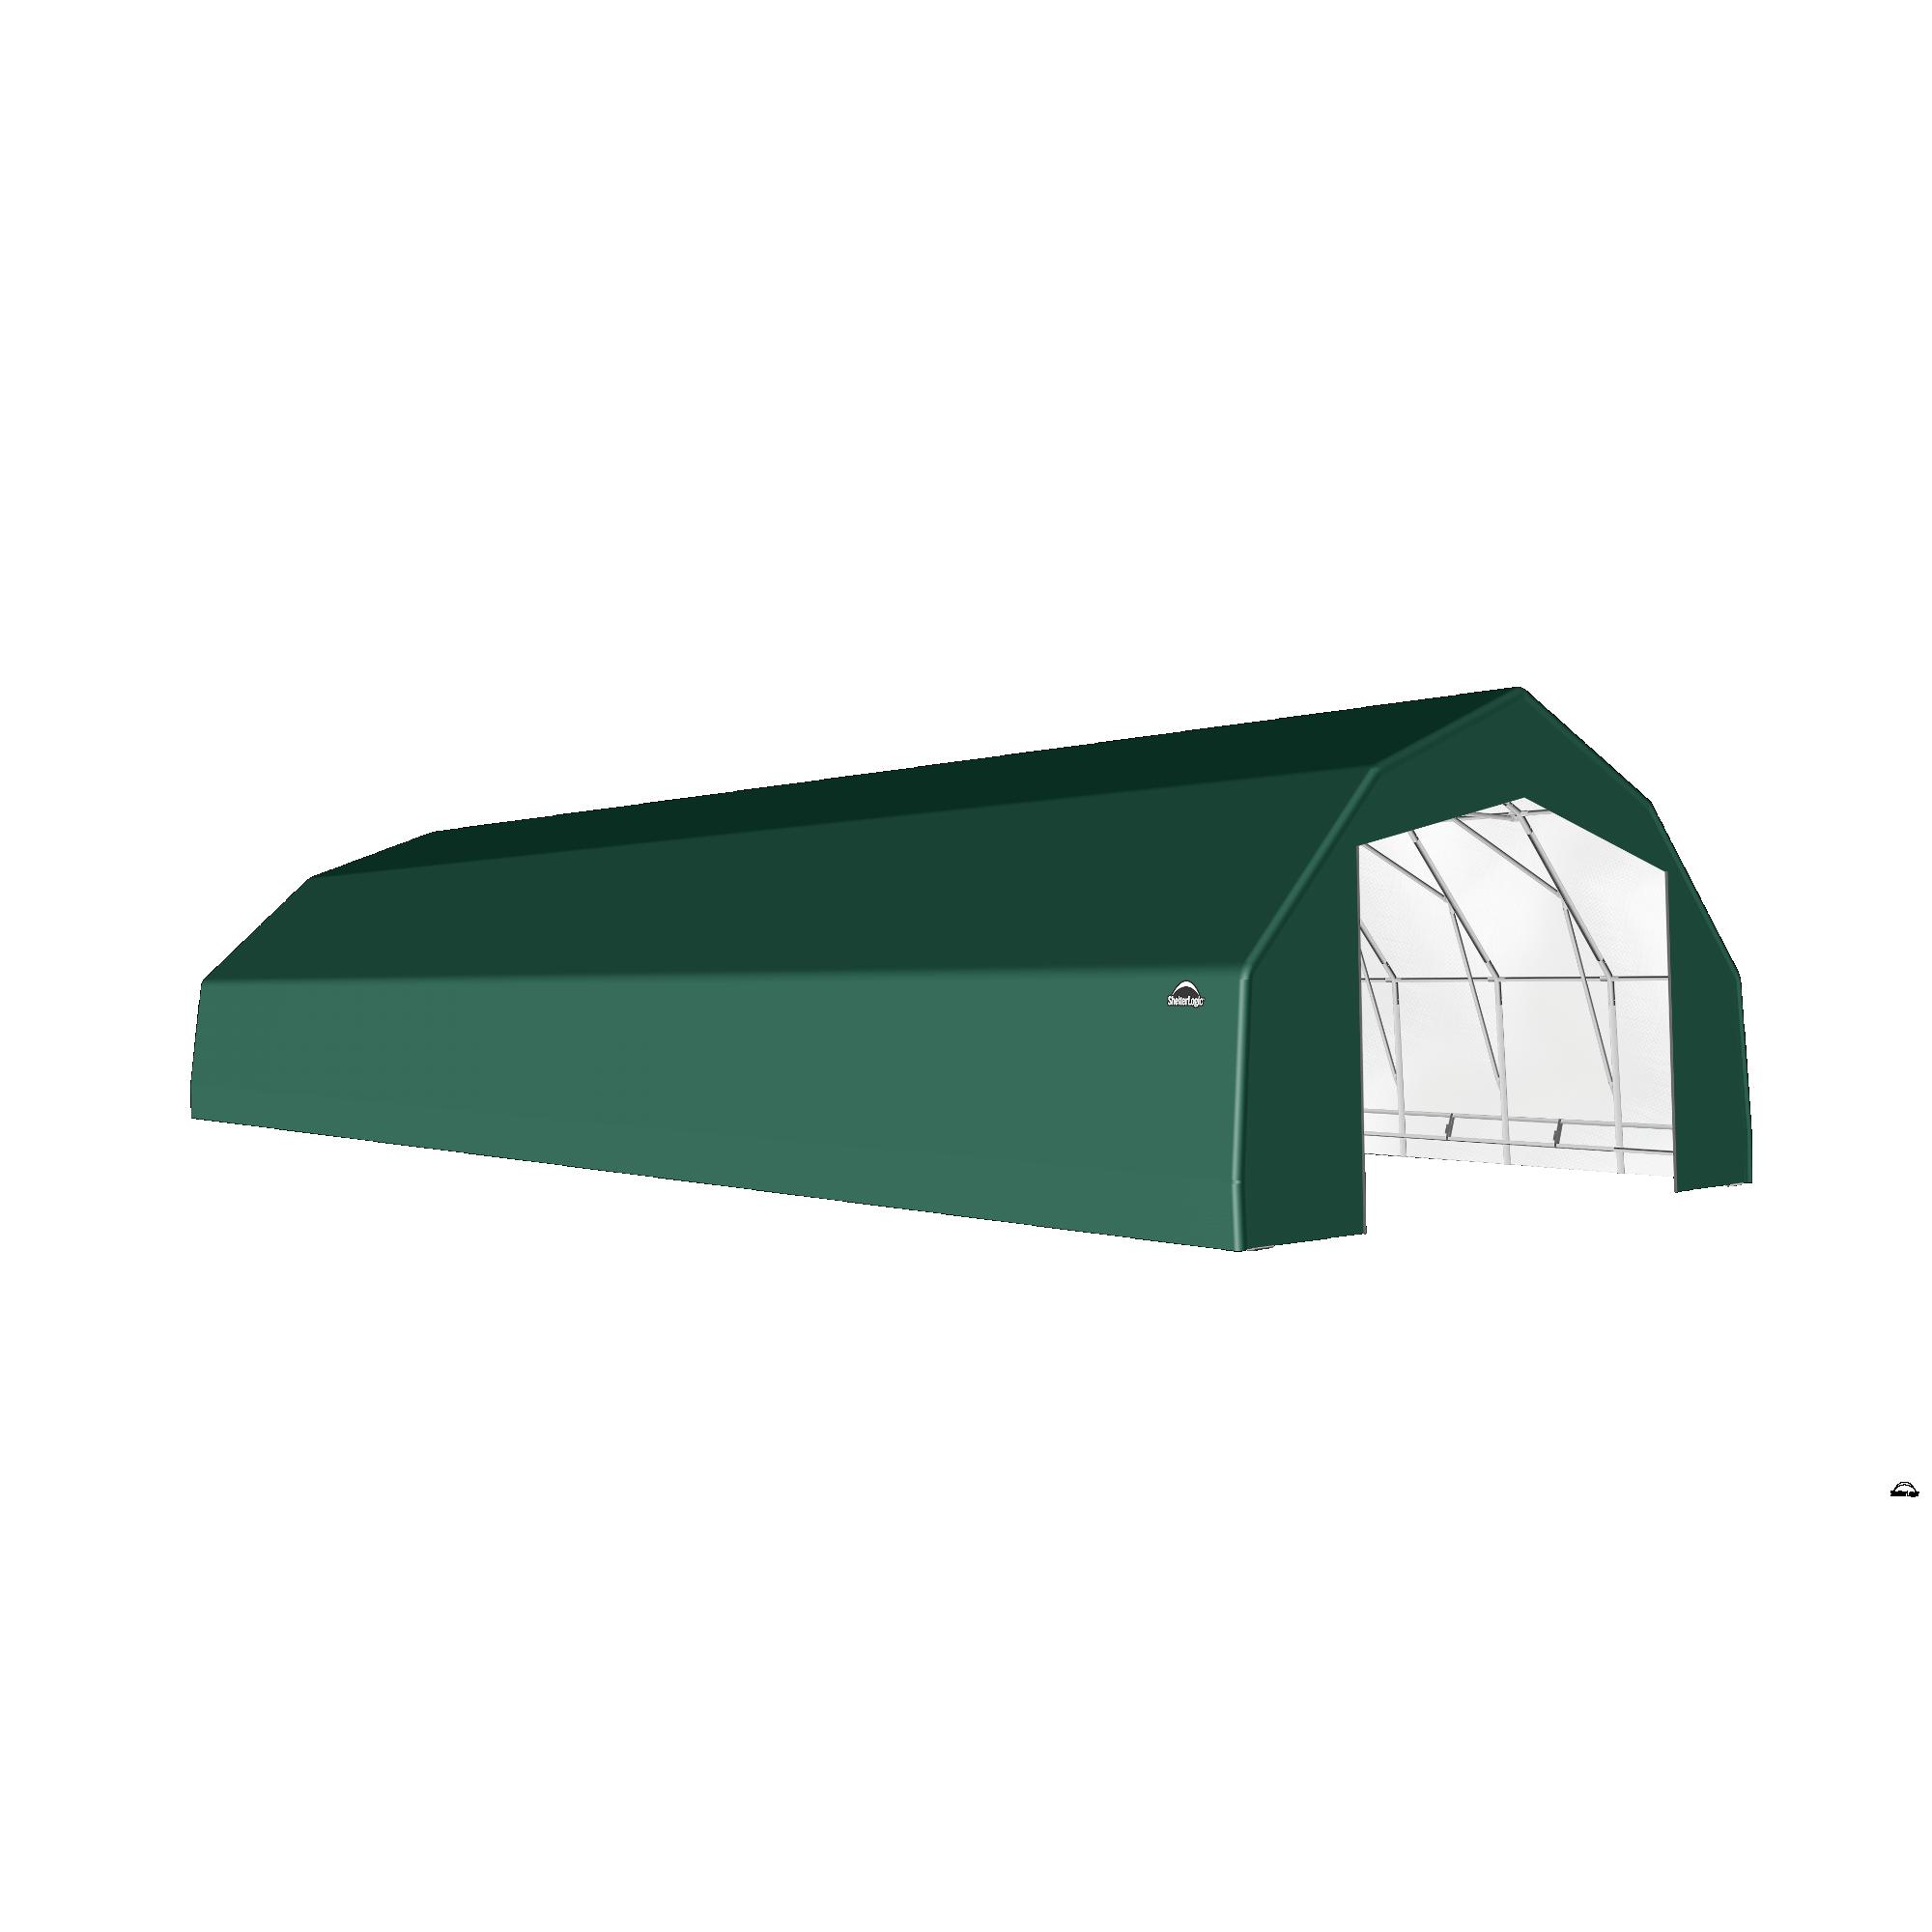 SP Barn 25X68X14 Green 14 oz PE Shelter